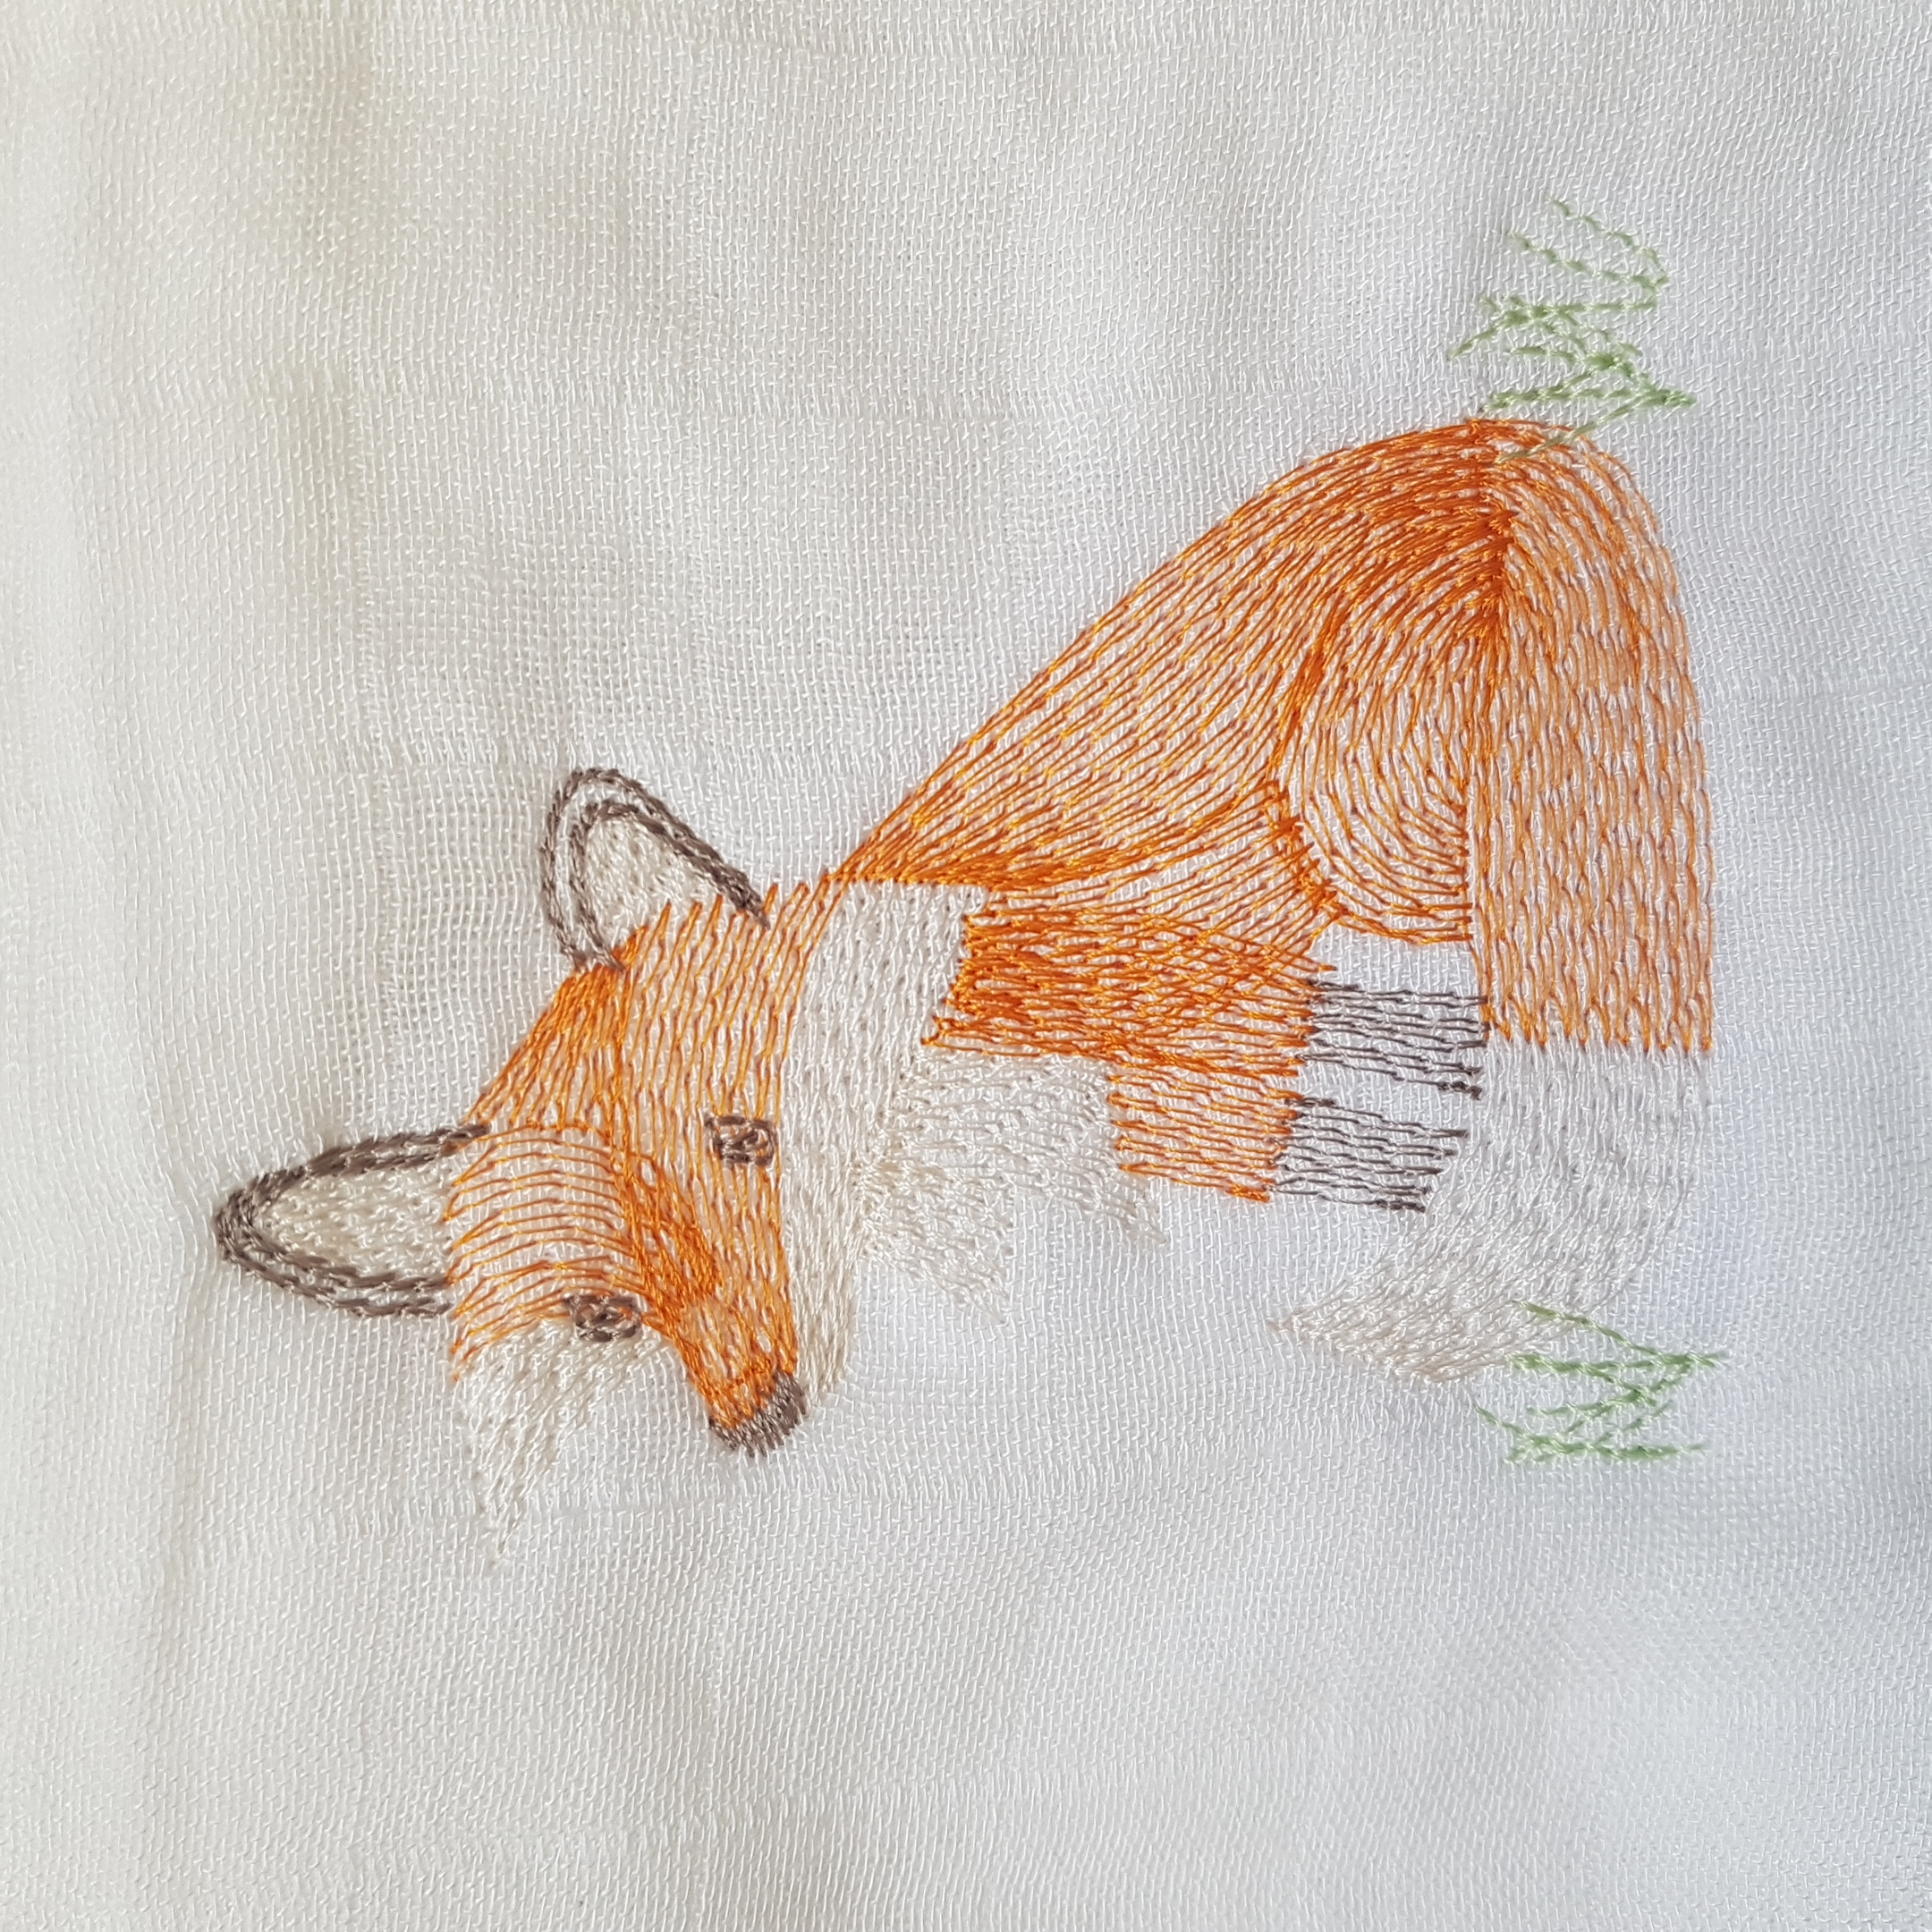 Un joli petit renard brodé